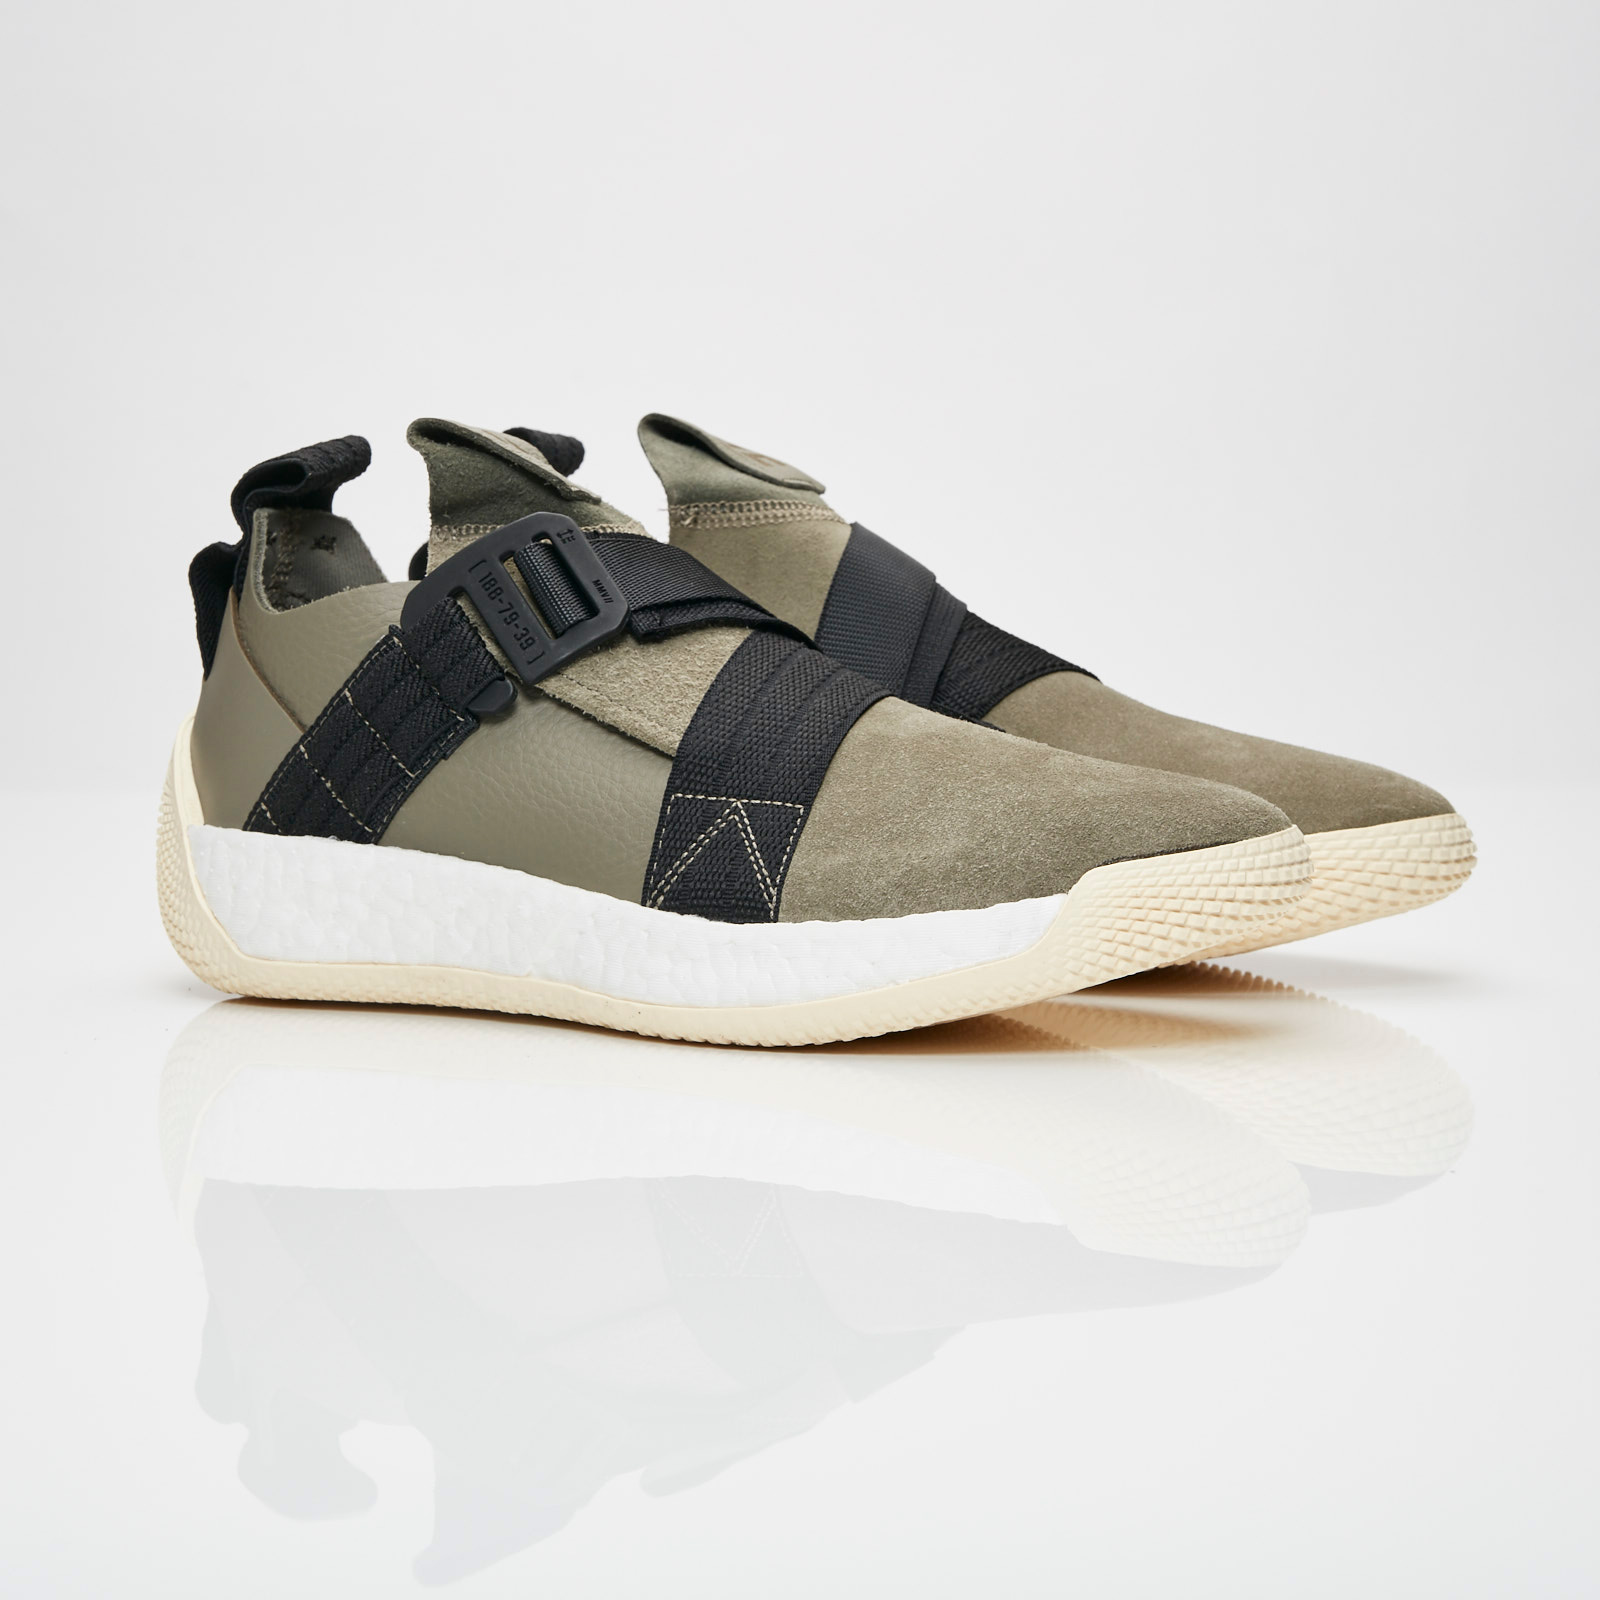 2367912a6985 adidas Harden LS 2 Buckle - Aq0020 - Sneakersnstuff